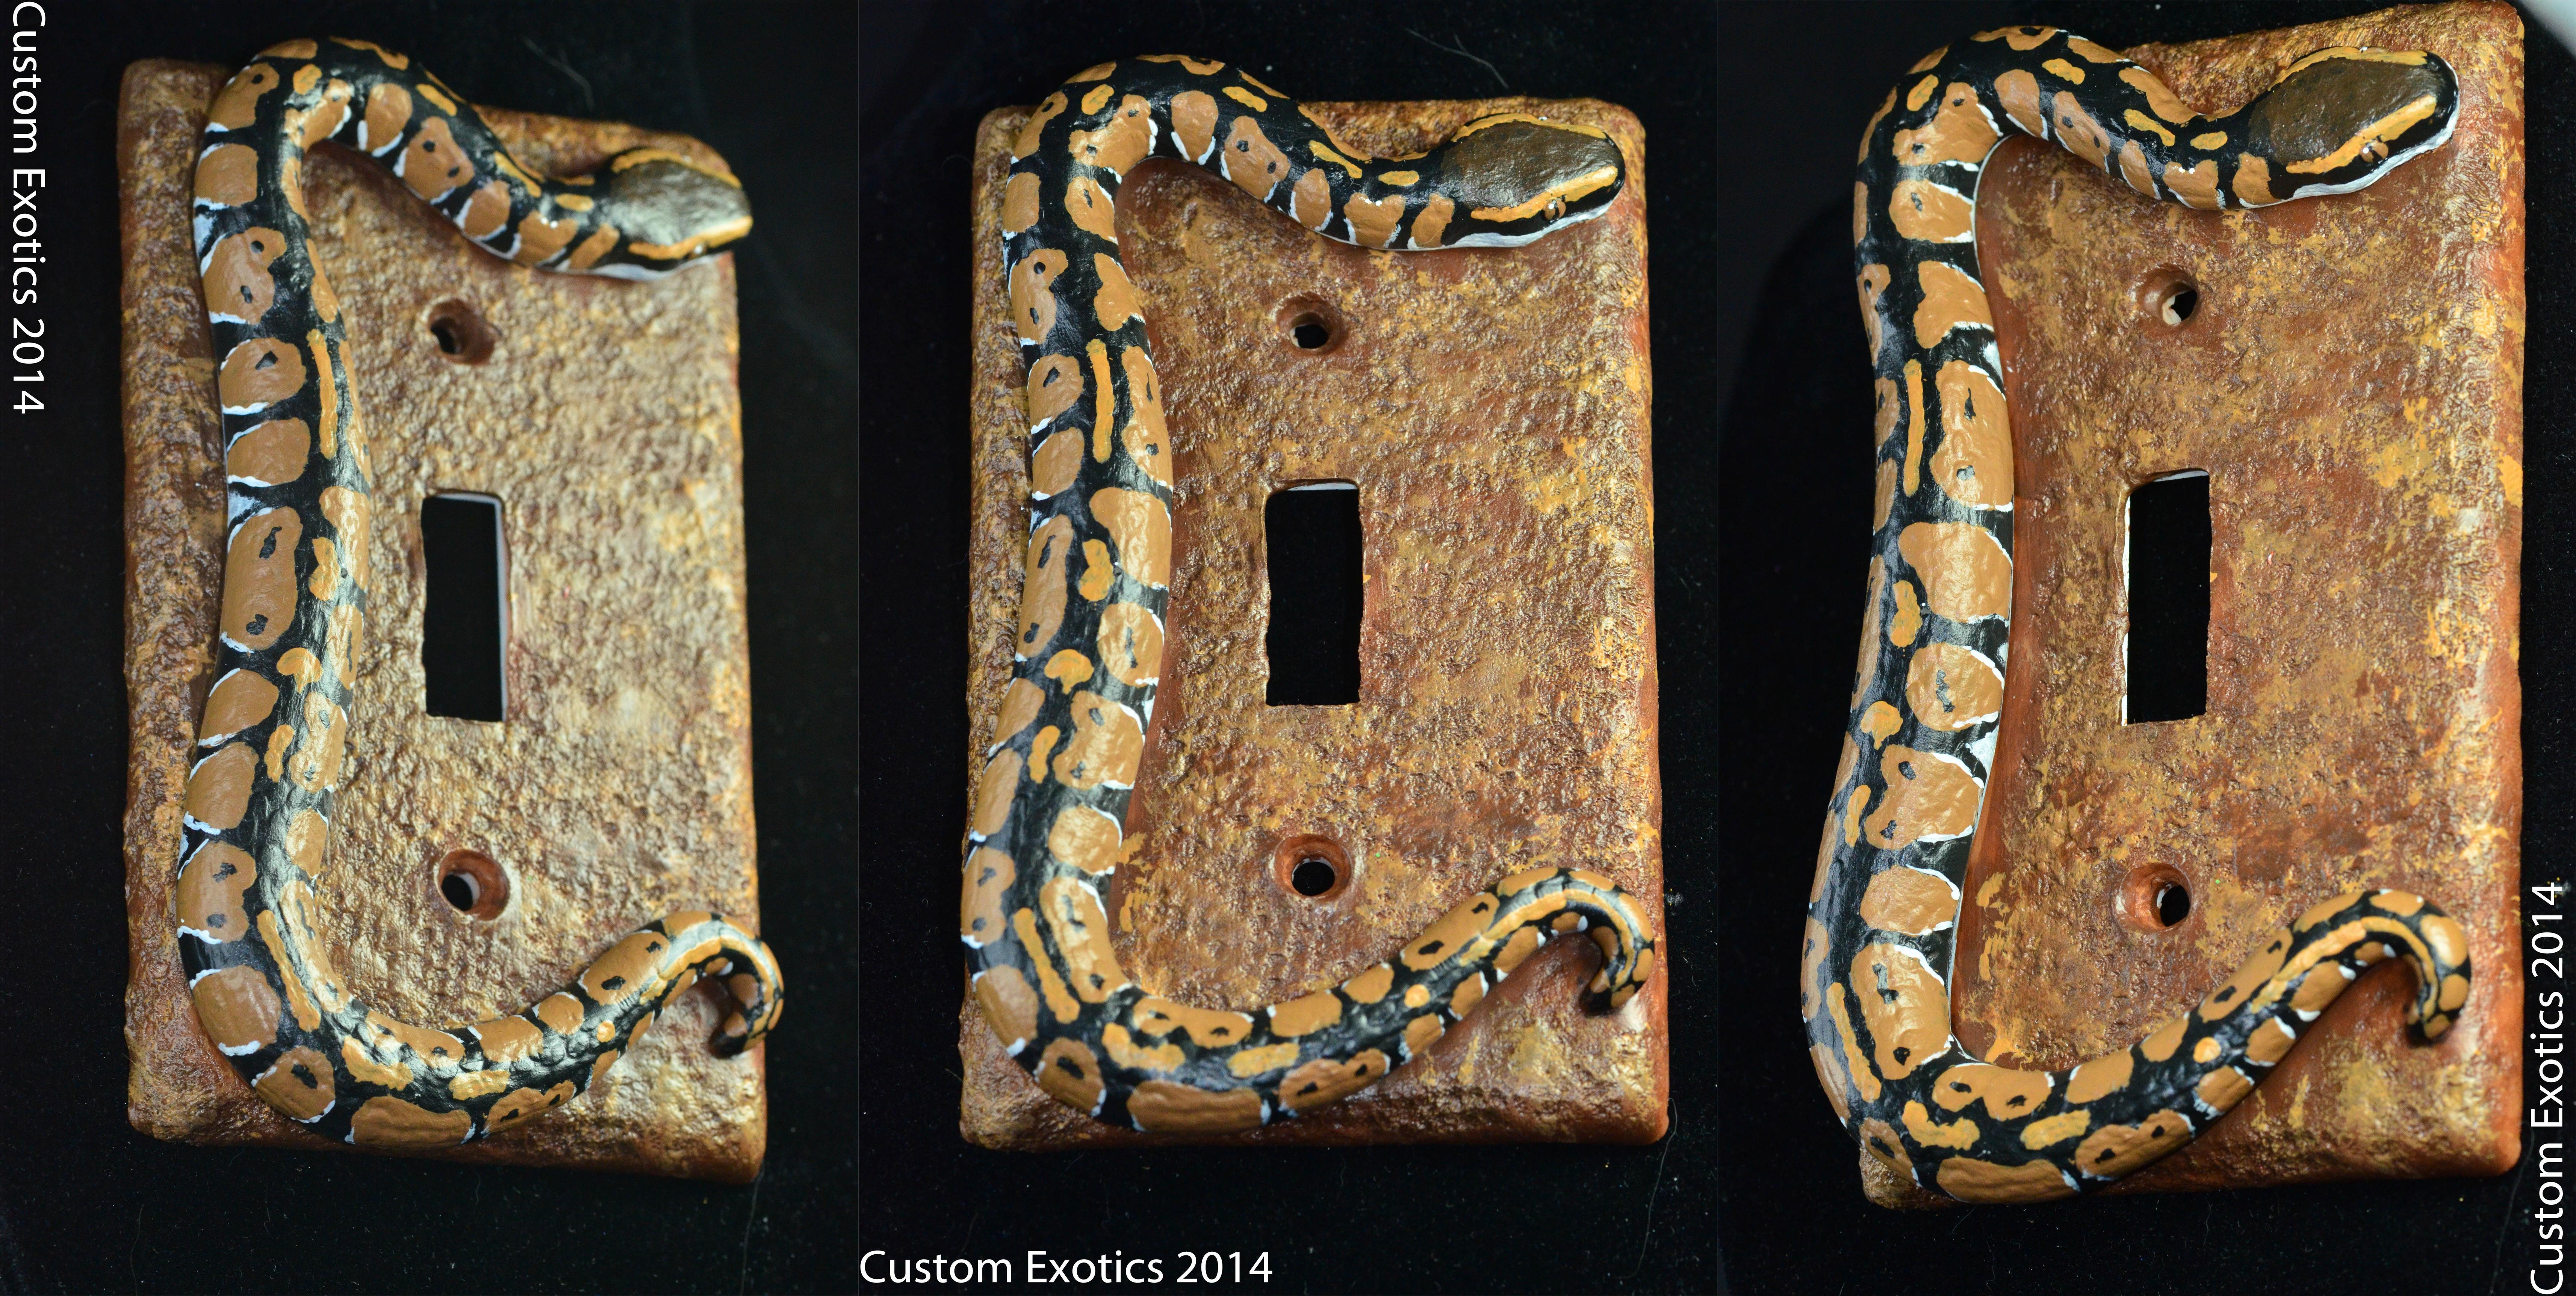 Timor Monitor Lizard Light Switch Plate Cover Weasyl